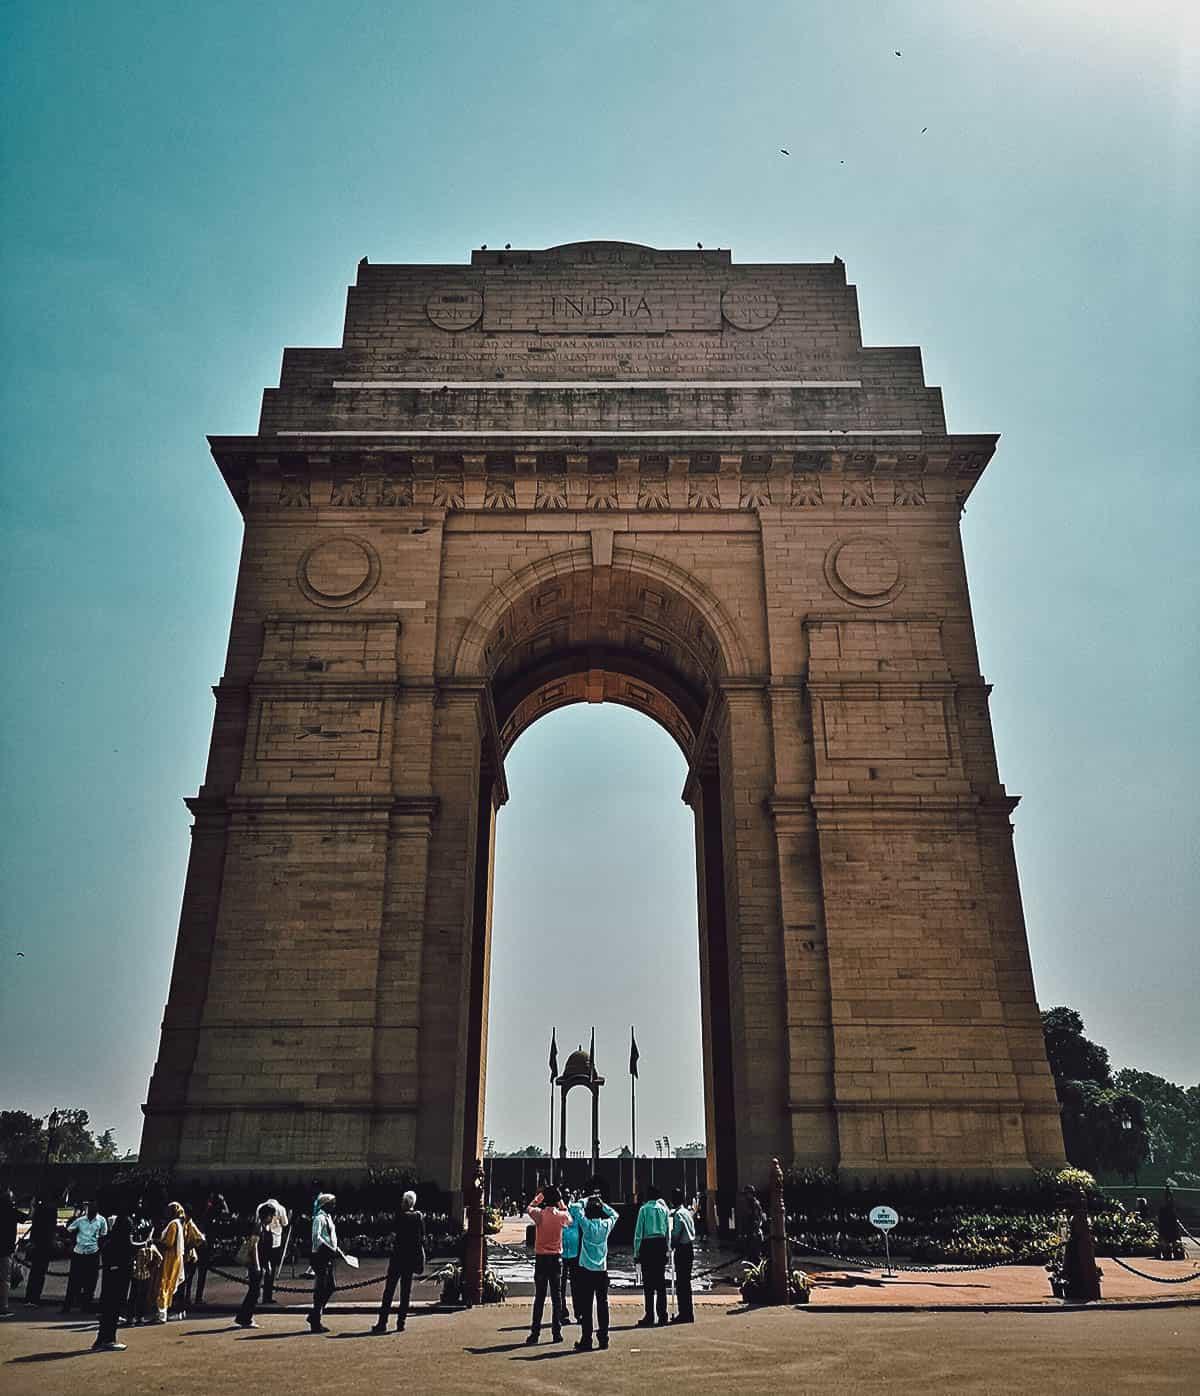 India Gate, Delhi, India